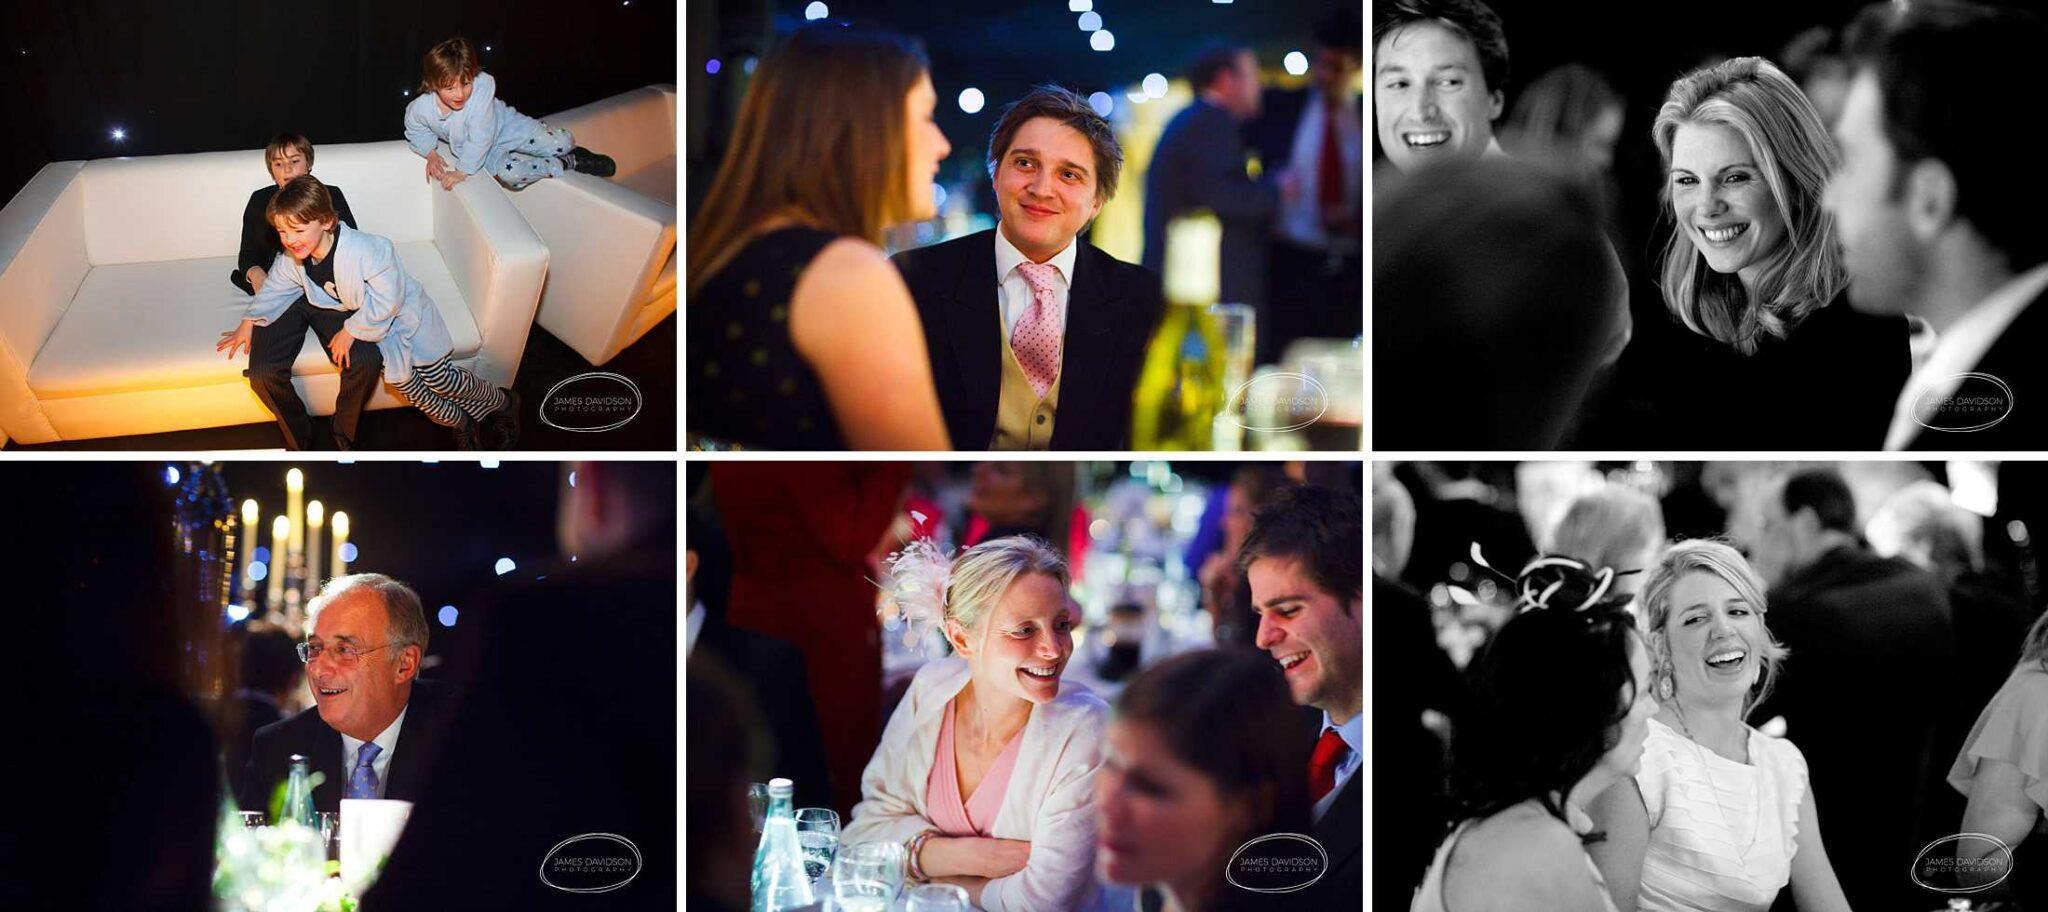 huddersfield-wedding-photography-047